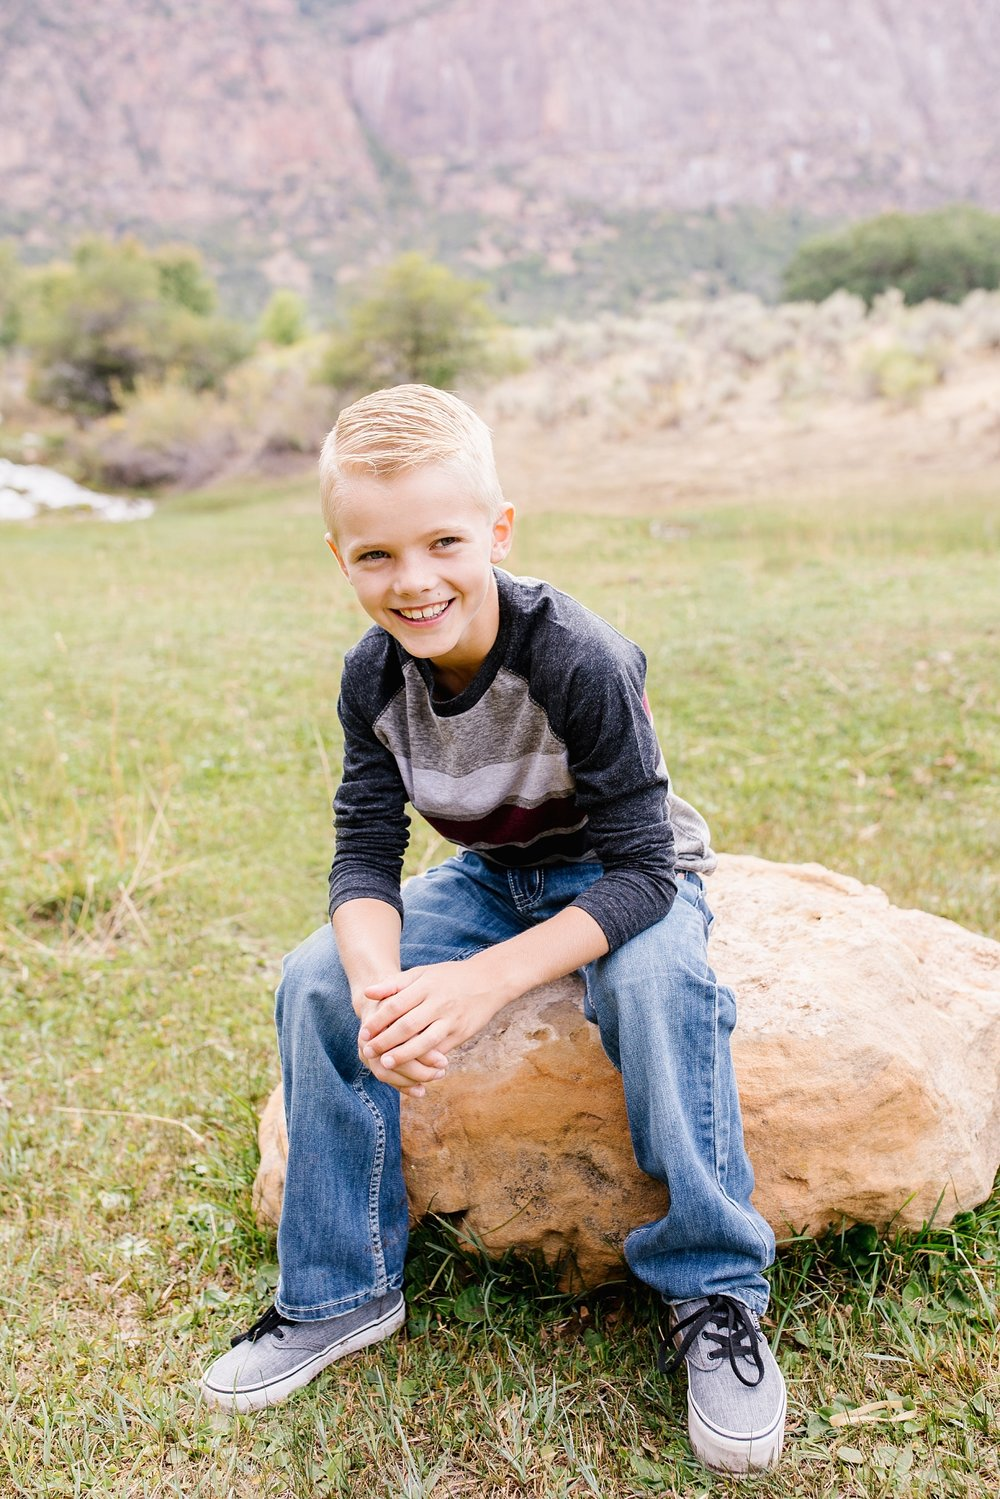 Foote-67_Lizzie-B-Imagery-Utah-Family-Photographer-Lifestyle-Photography-Salt-Lake-City-Park-City-Utah-County.jpg